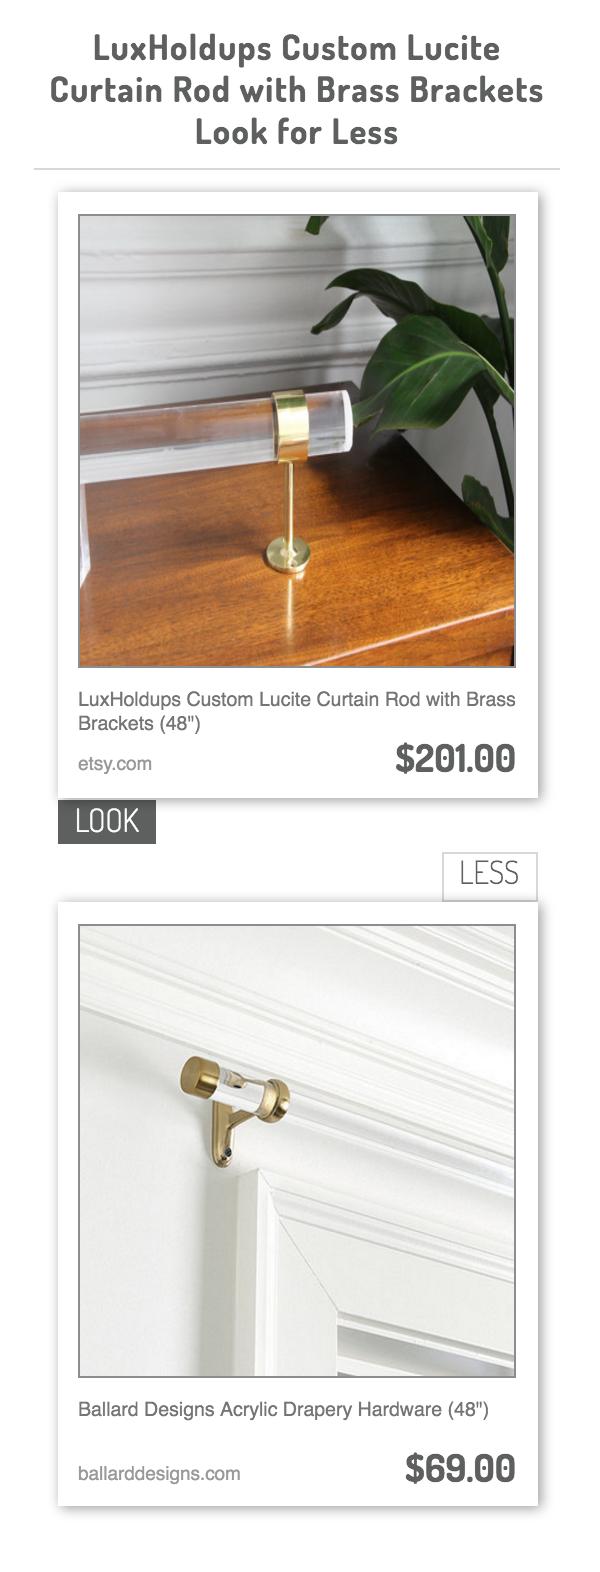 Luxholdups Custom Lucite Curtain Rod With Brass Brackets Vs